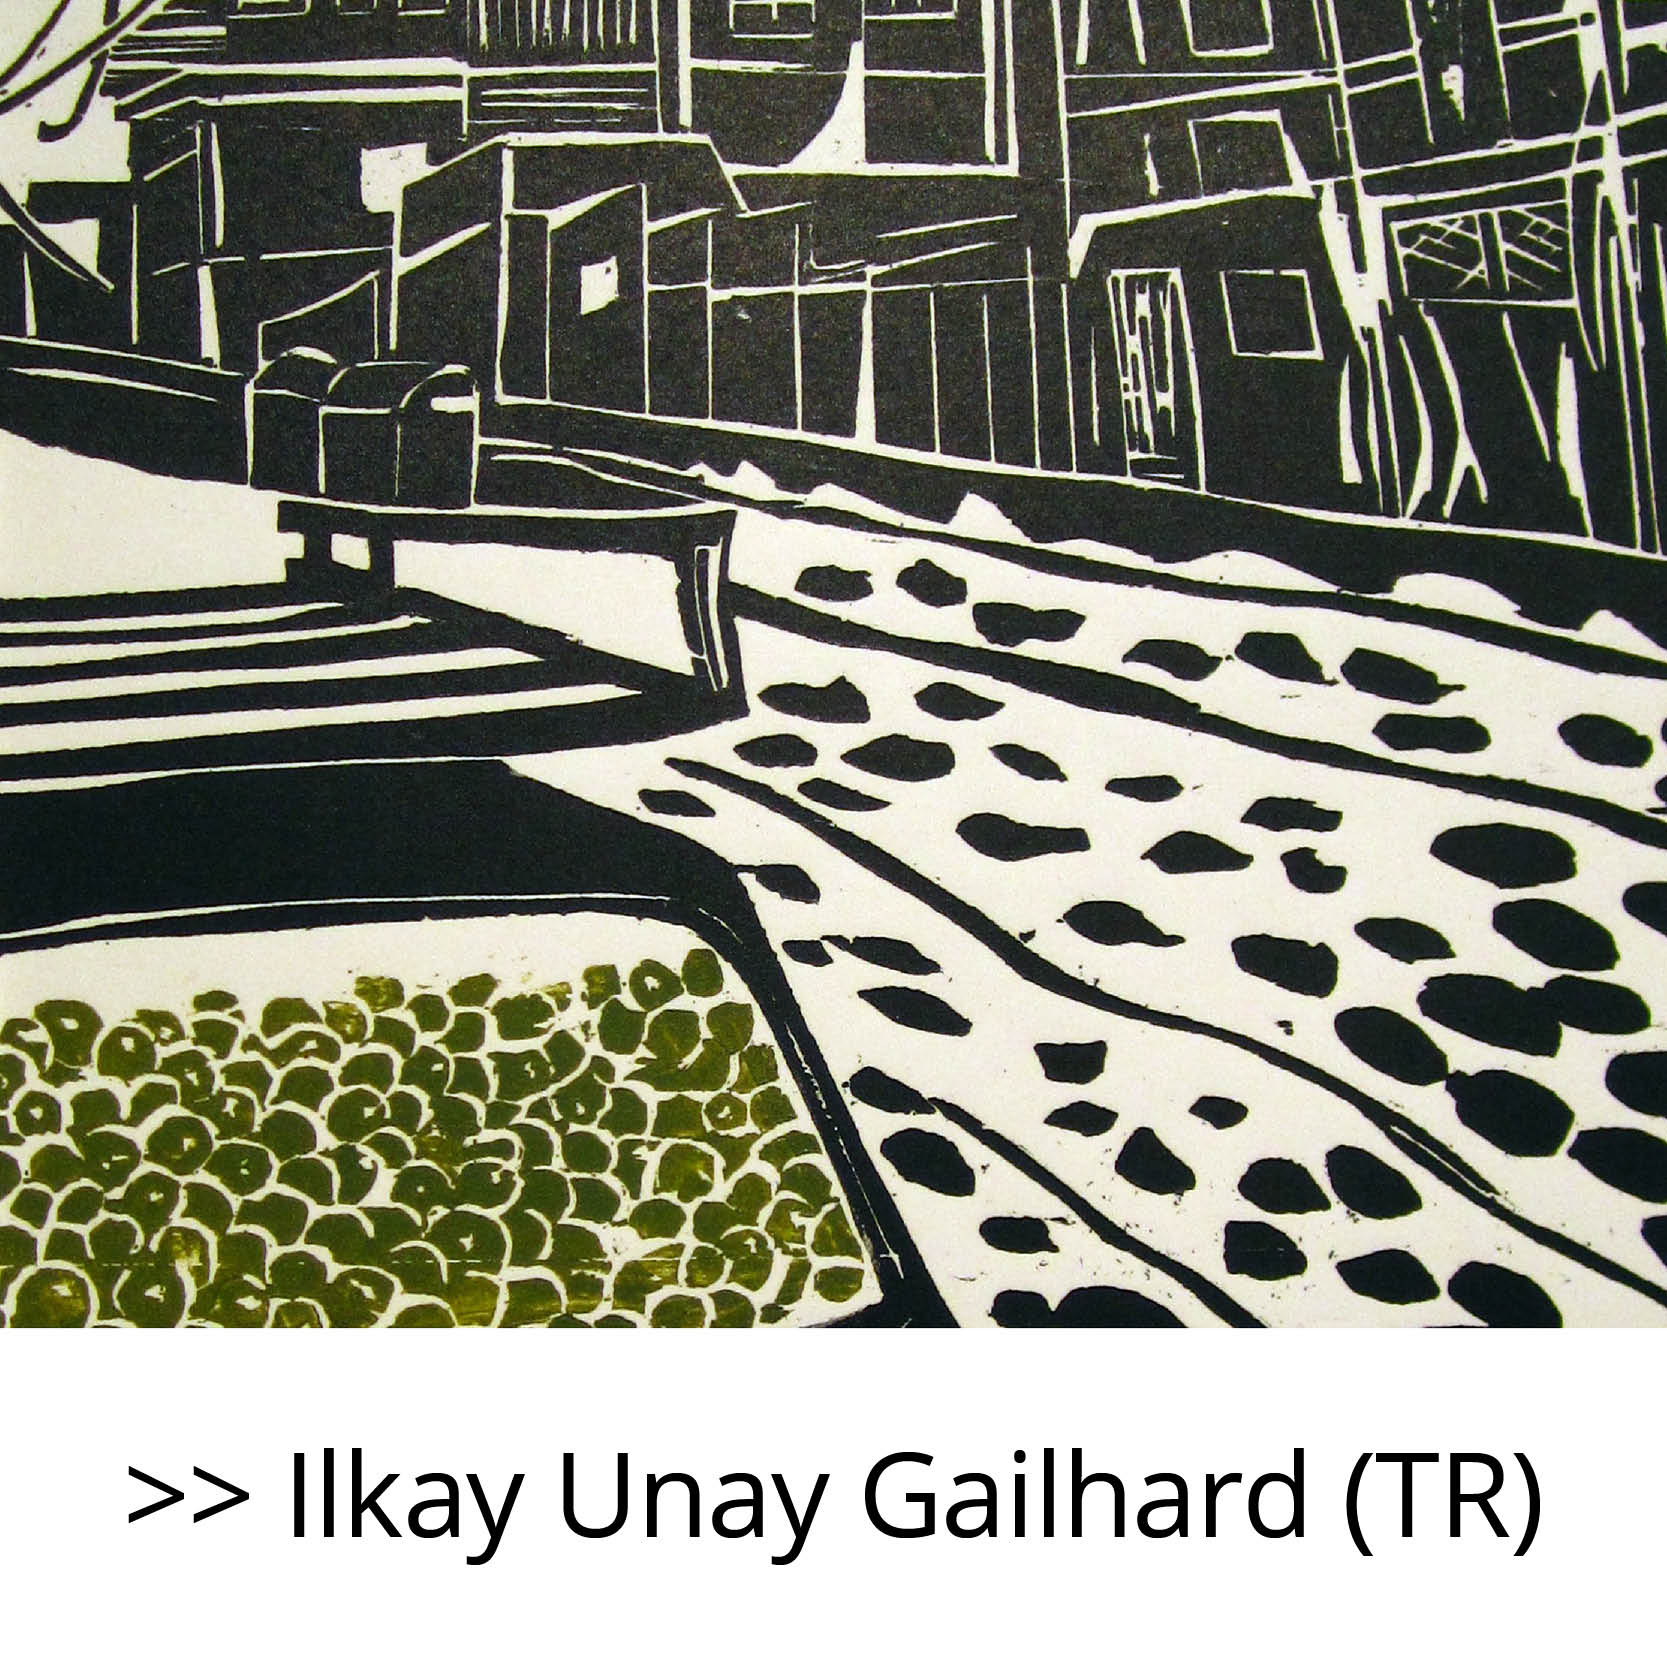 Ilkay_Unay_Gailhard_(TR)